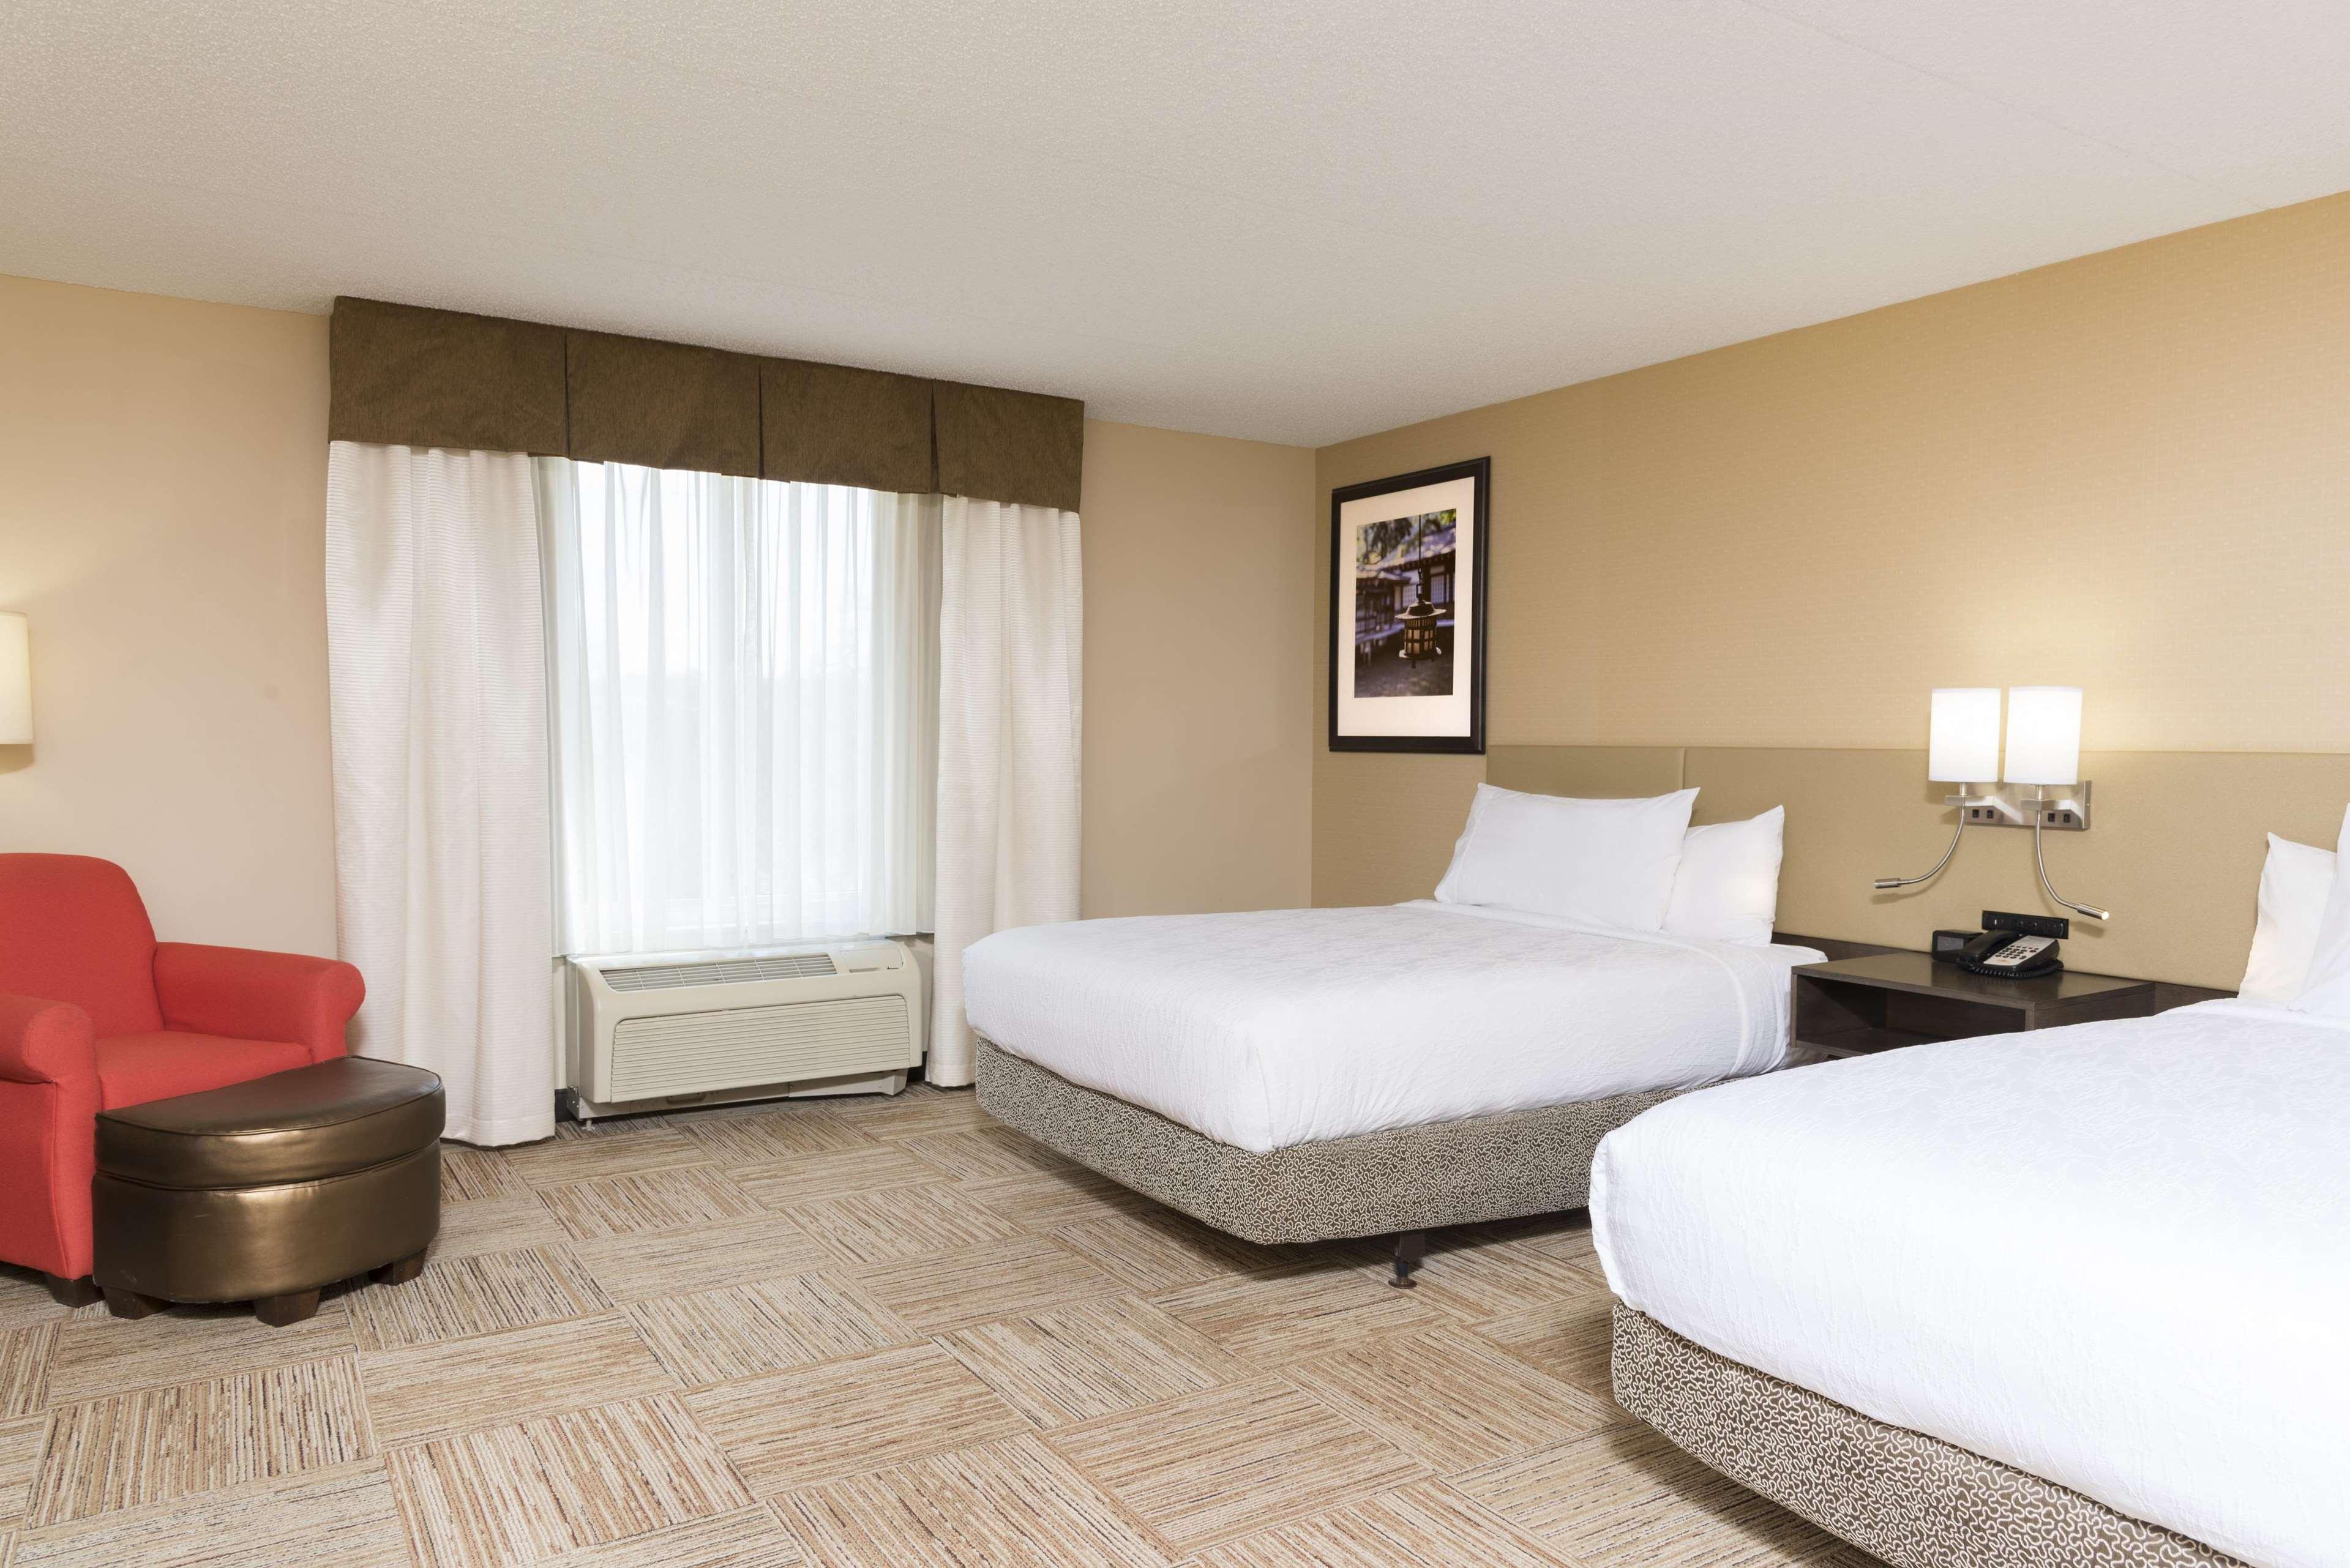 Hilton Garden Inn West Lafayette Wabash Landing image 48